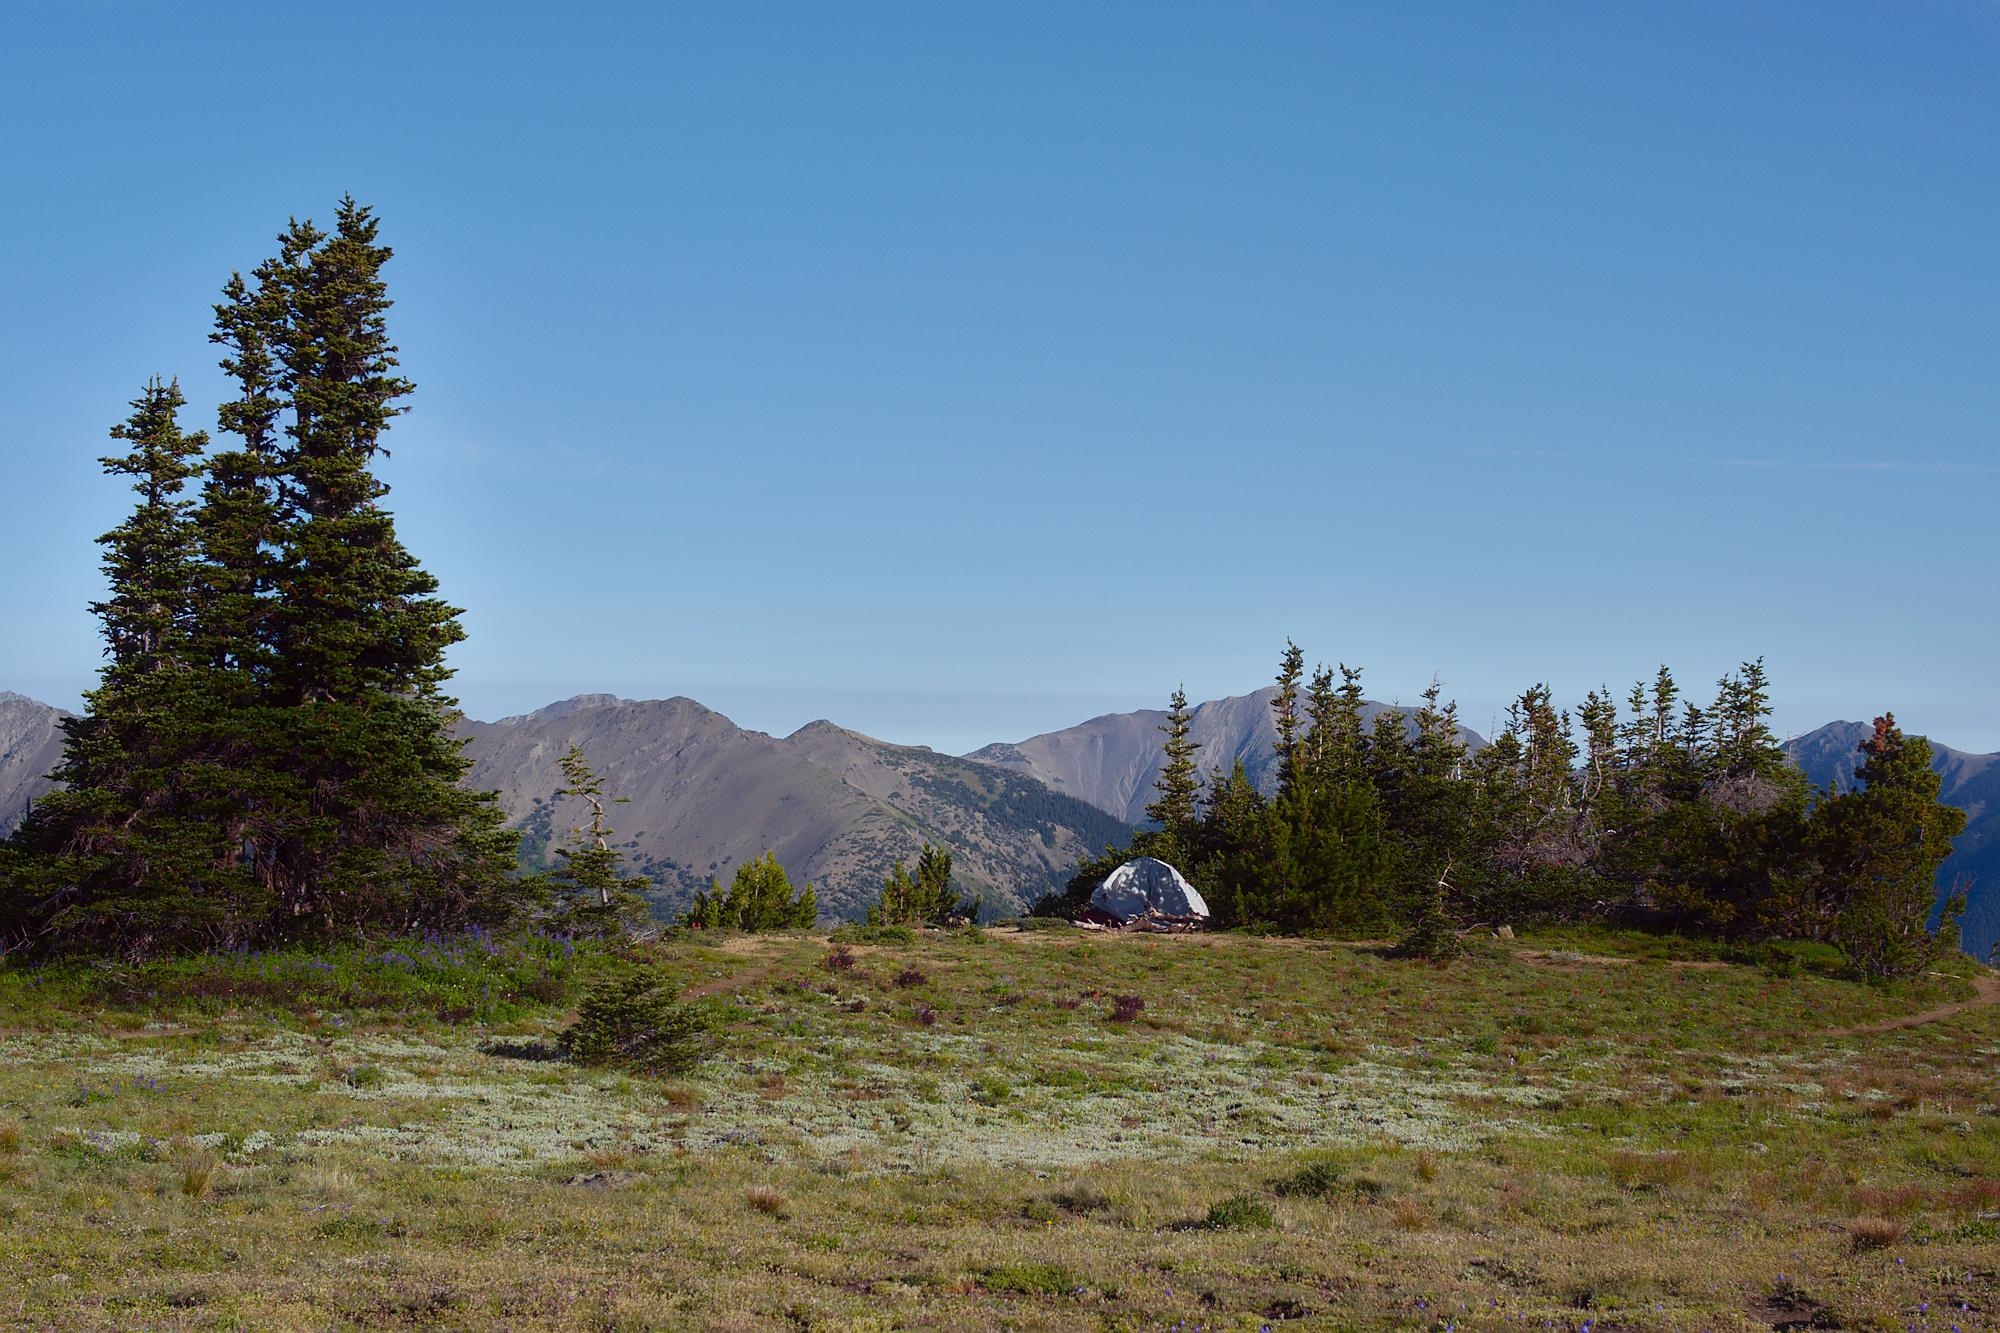 Olympic Peninsula, WA, landscapes, camping